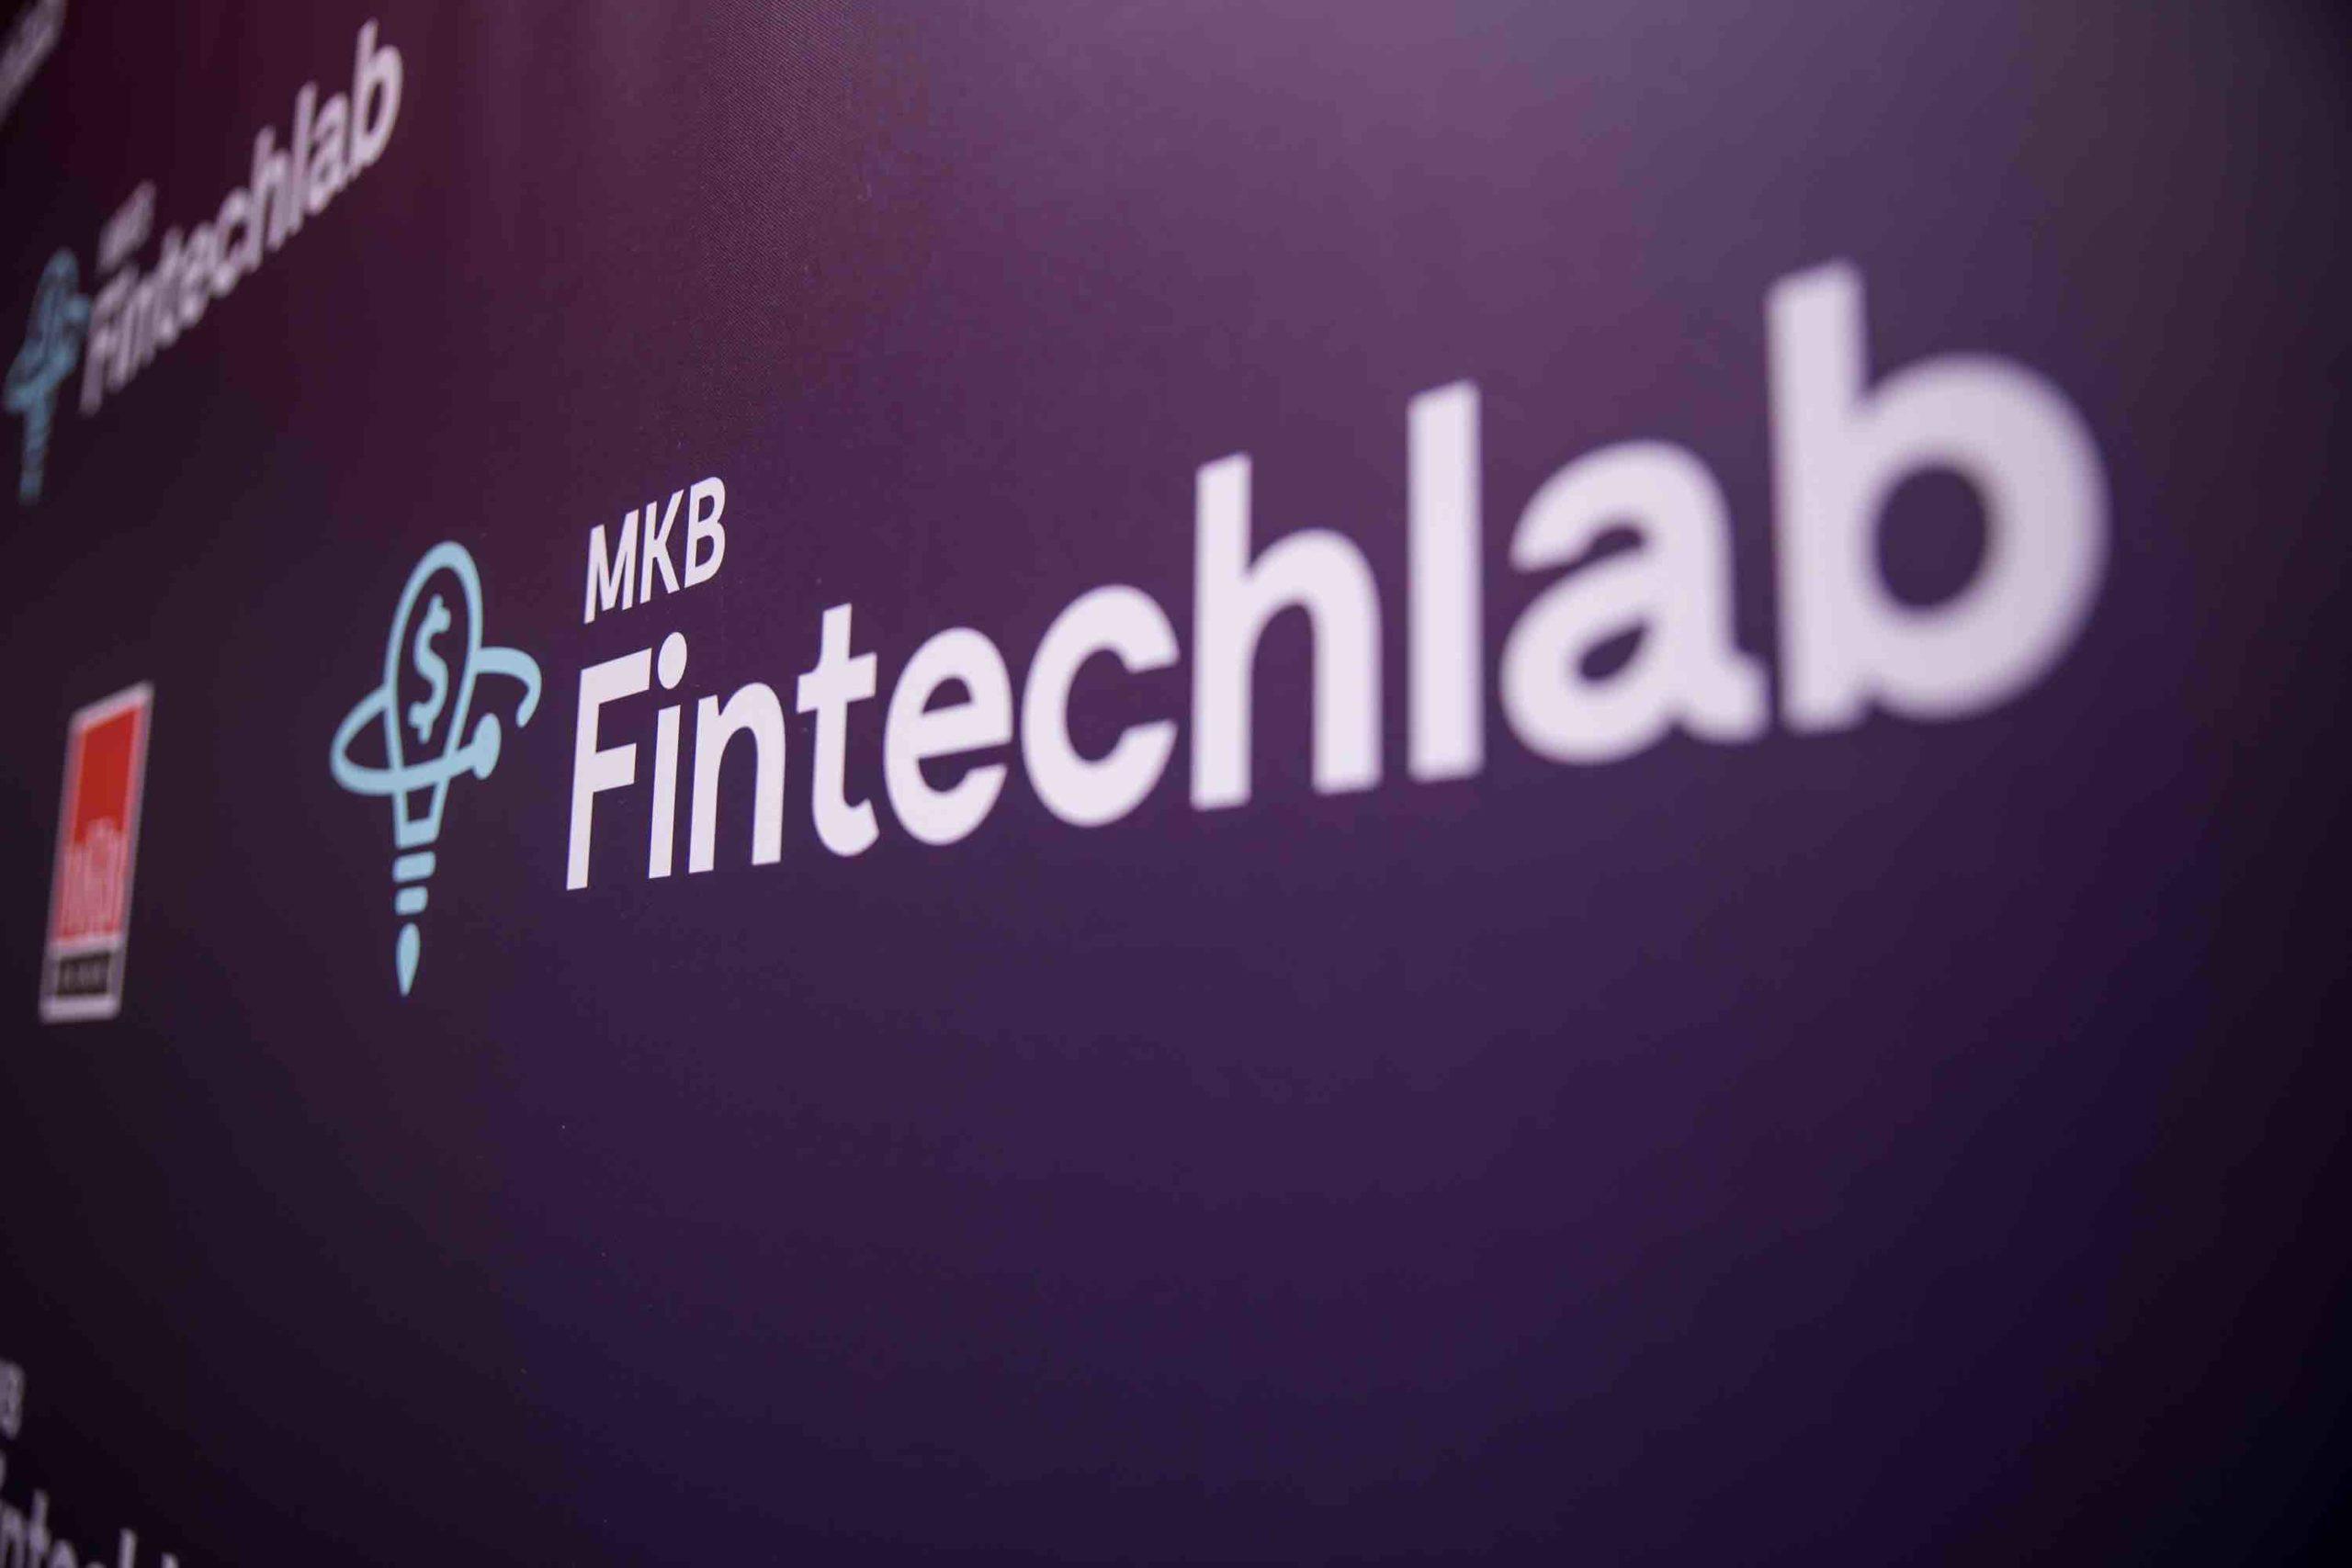 MKB fintechlab demoday